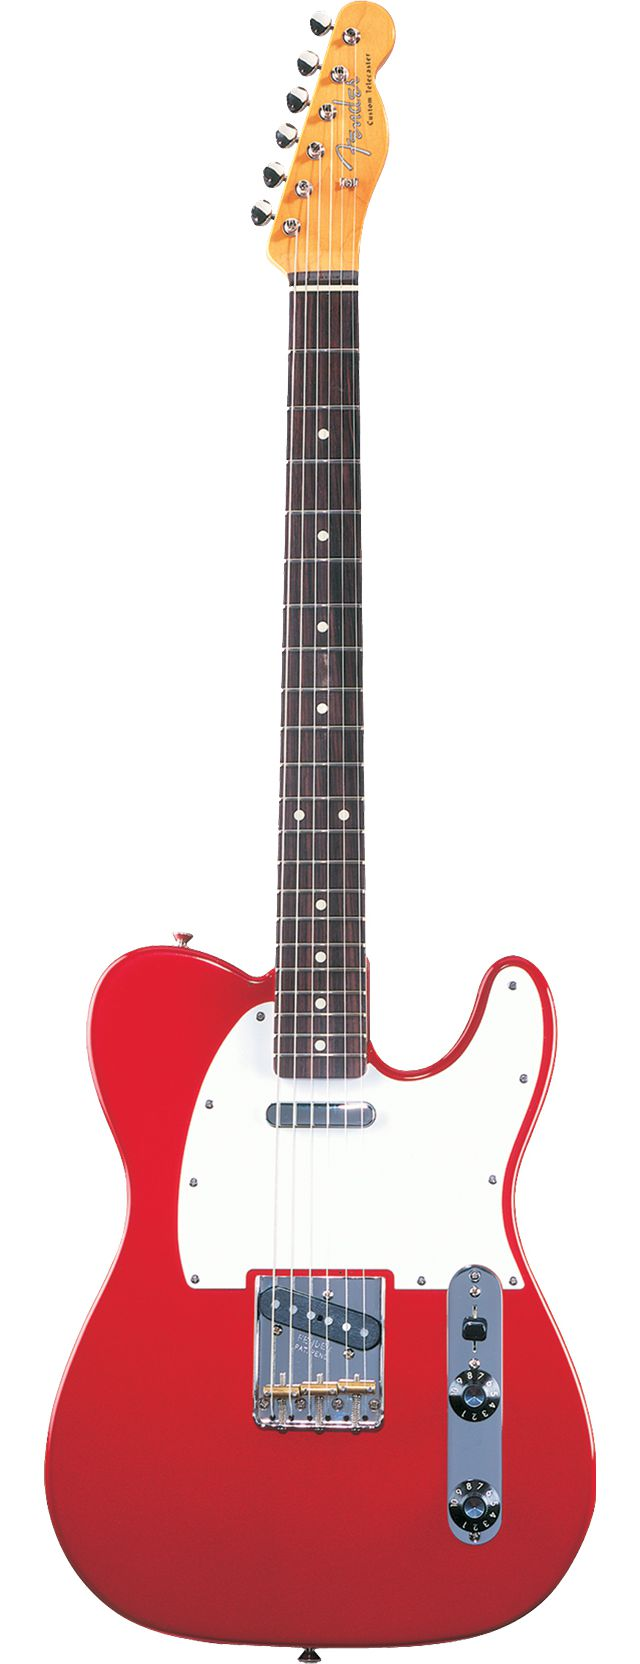 Fender Telecaster Muddy Waters